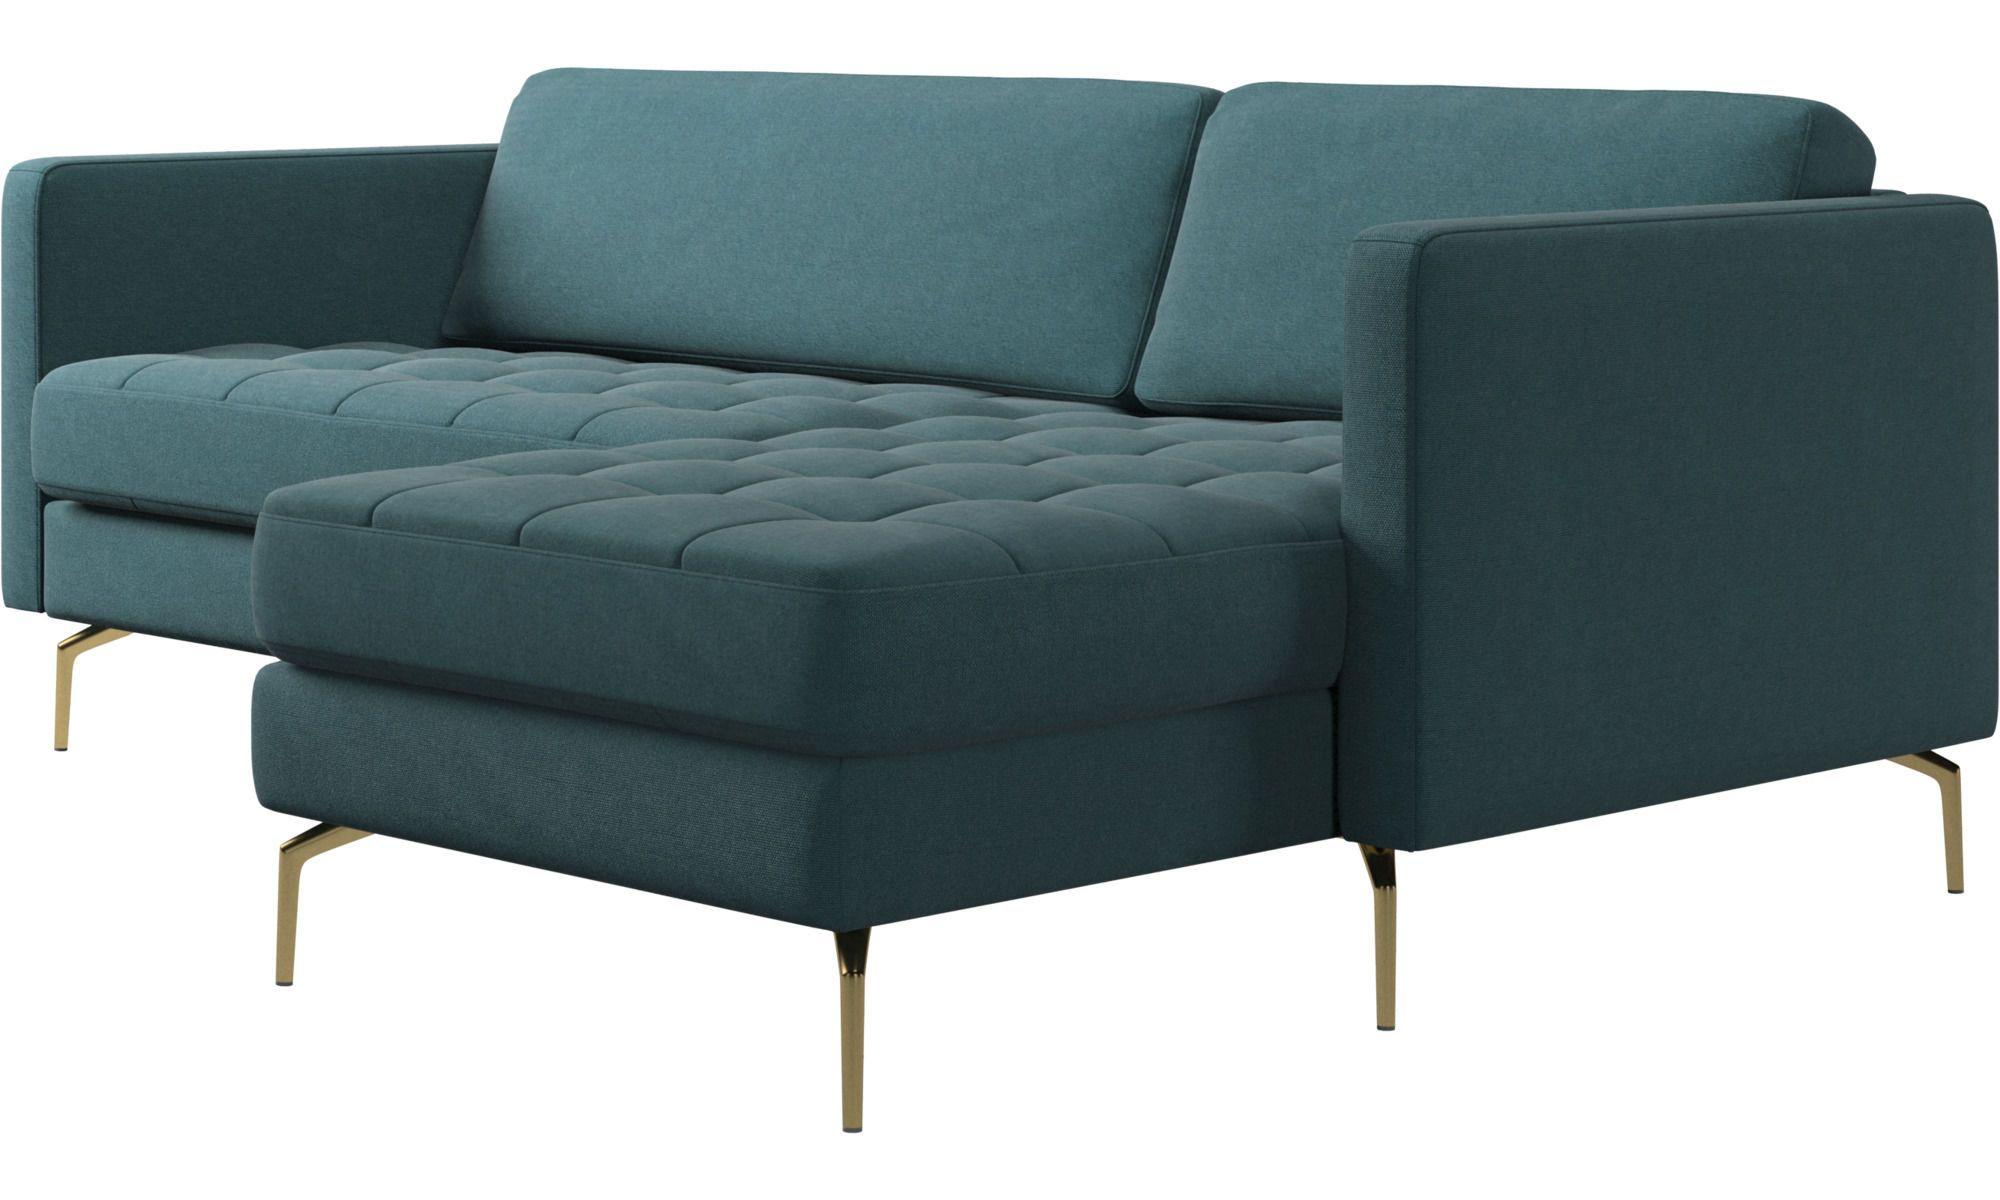 Osaka Sofa With Resting Unit Tufted Seat Chaise Longue